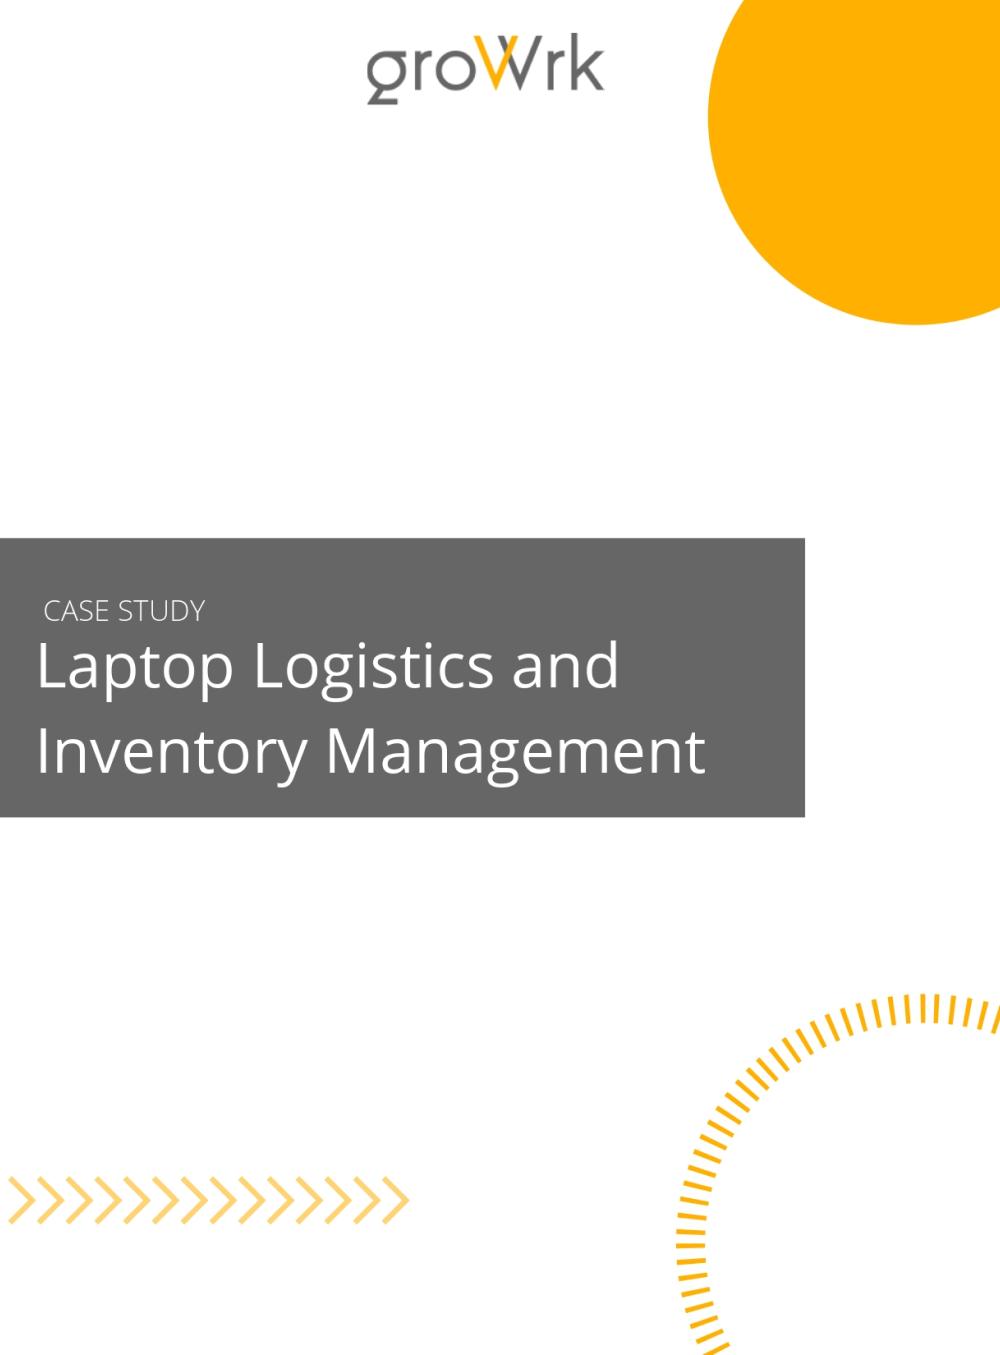 Laptop Logistics and Inventory Management